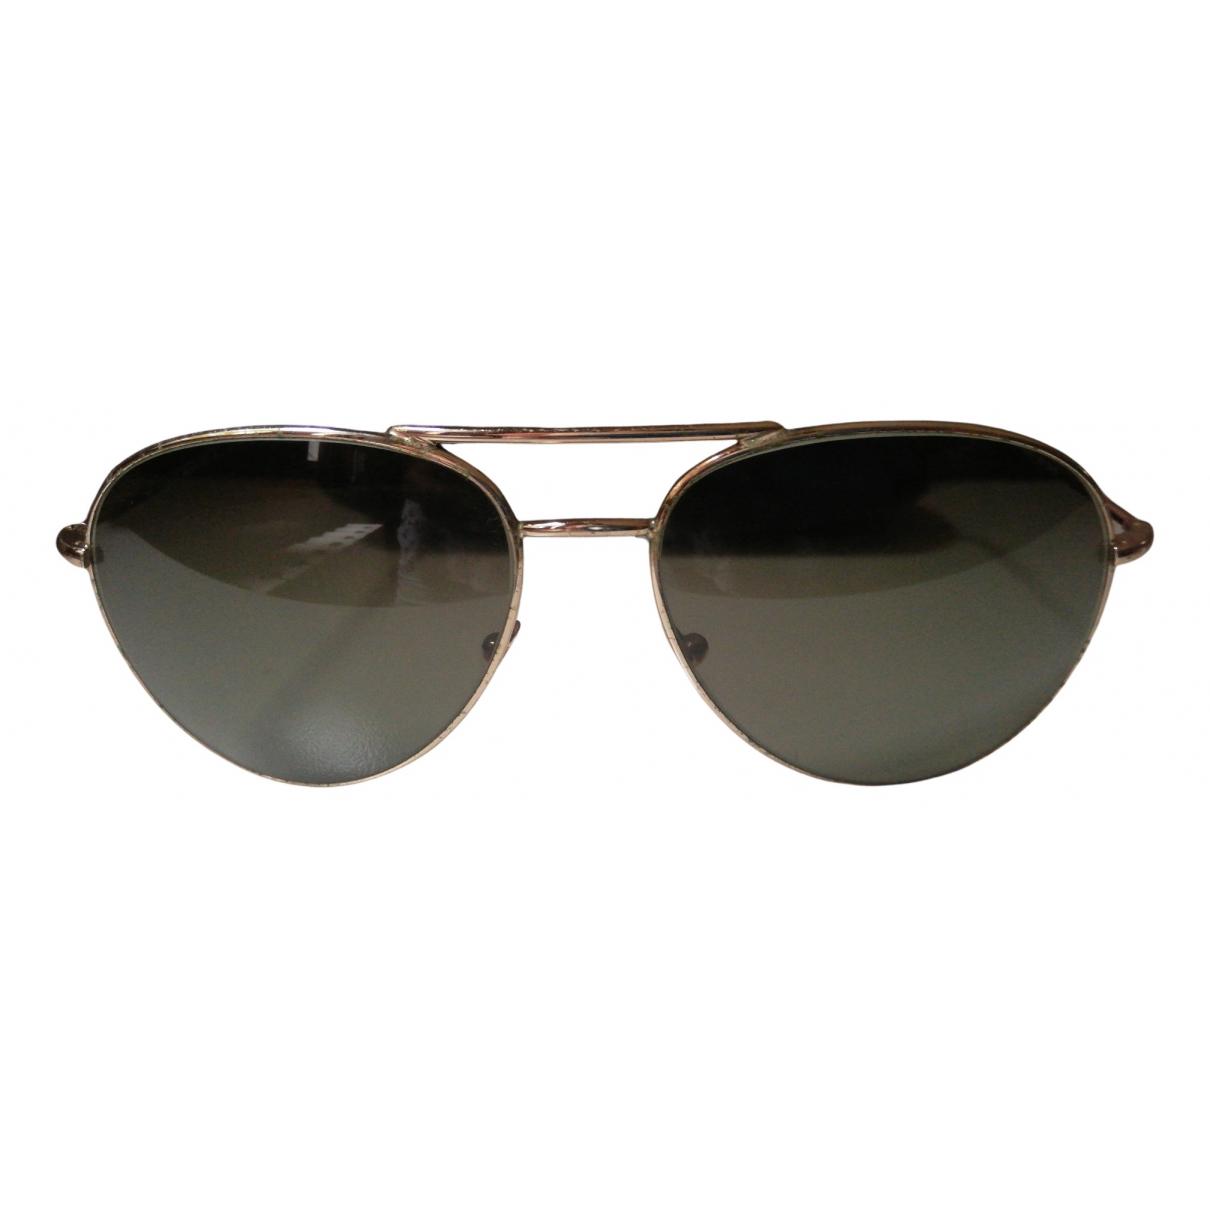 Gucci N Multicolour Metal Sunglasses for Women N